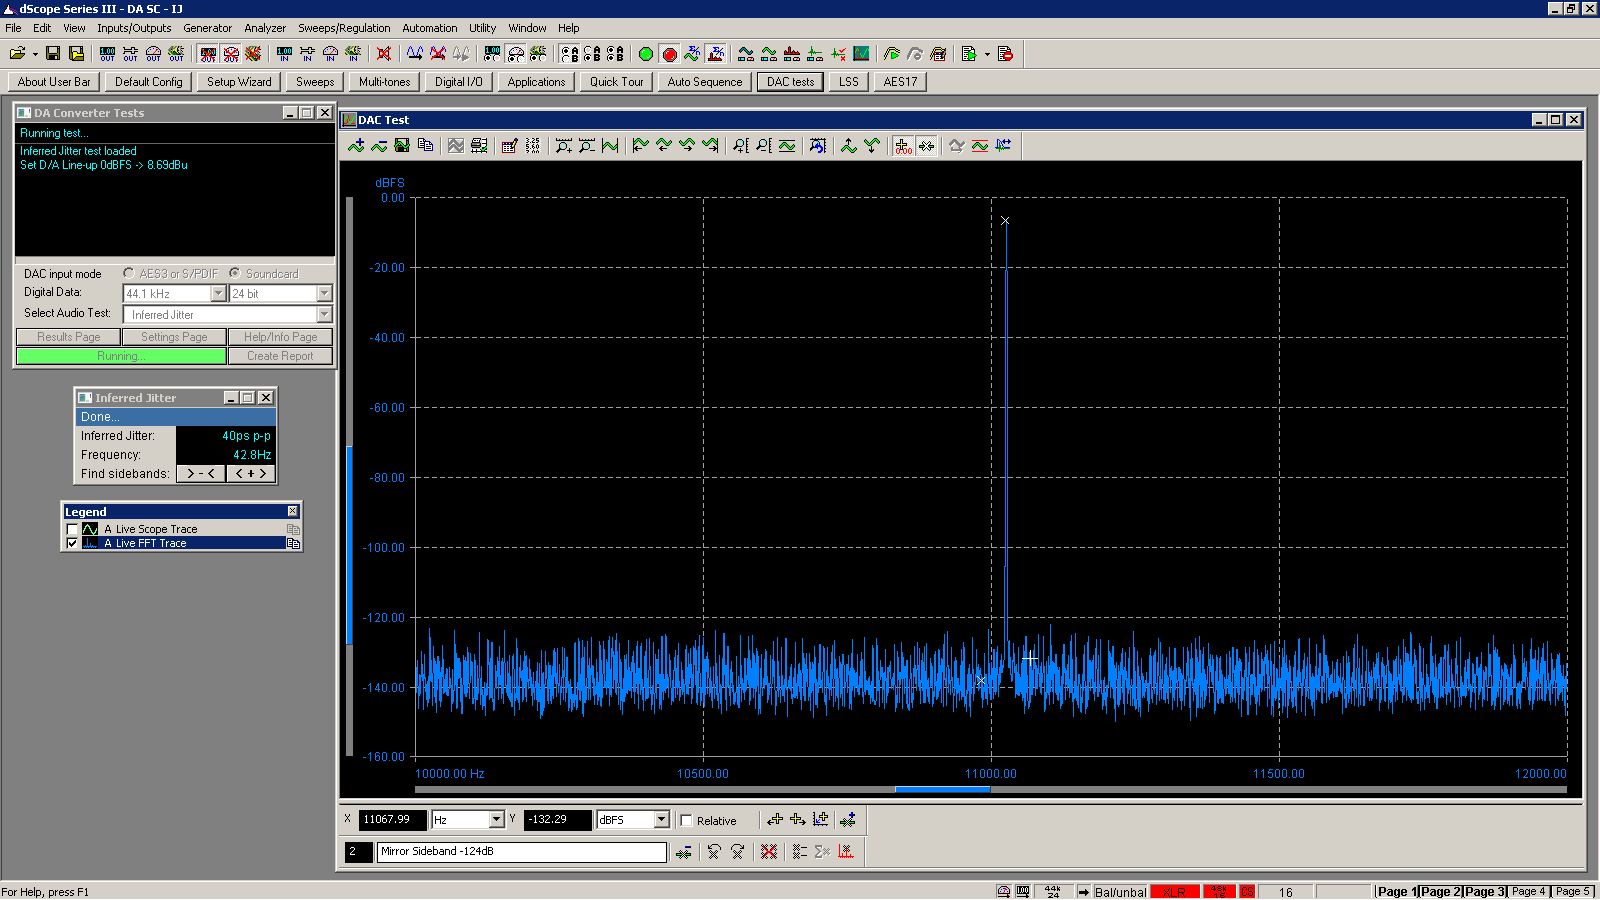 20160812 Modi MB inferred jitter - 2 KHz BW - u12 - spdif.png